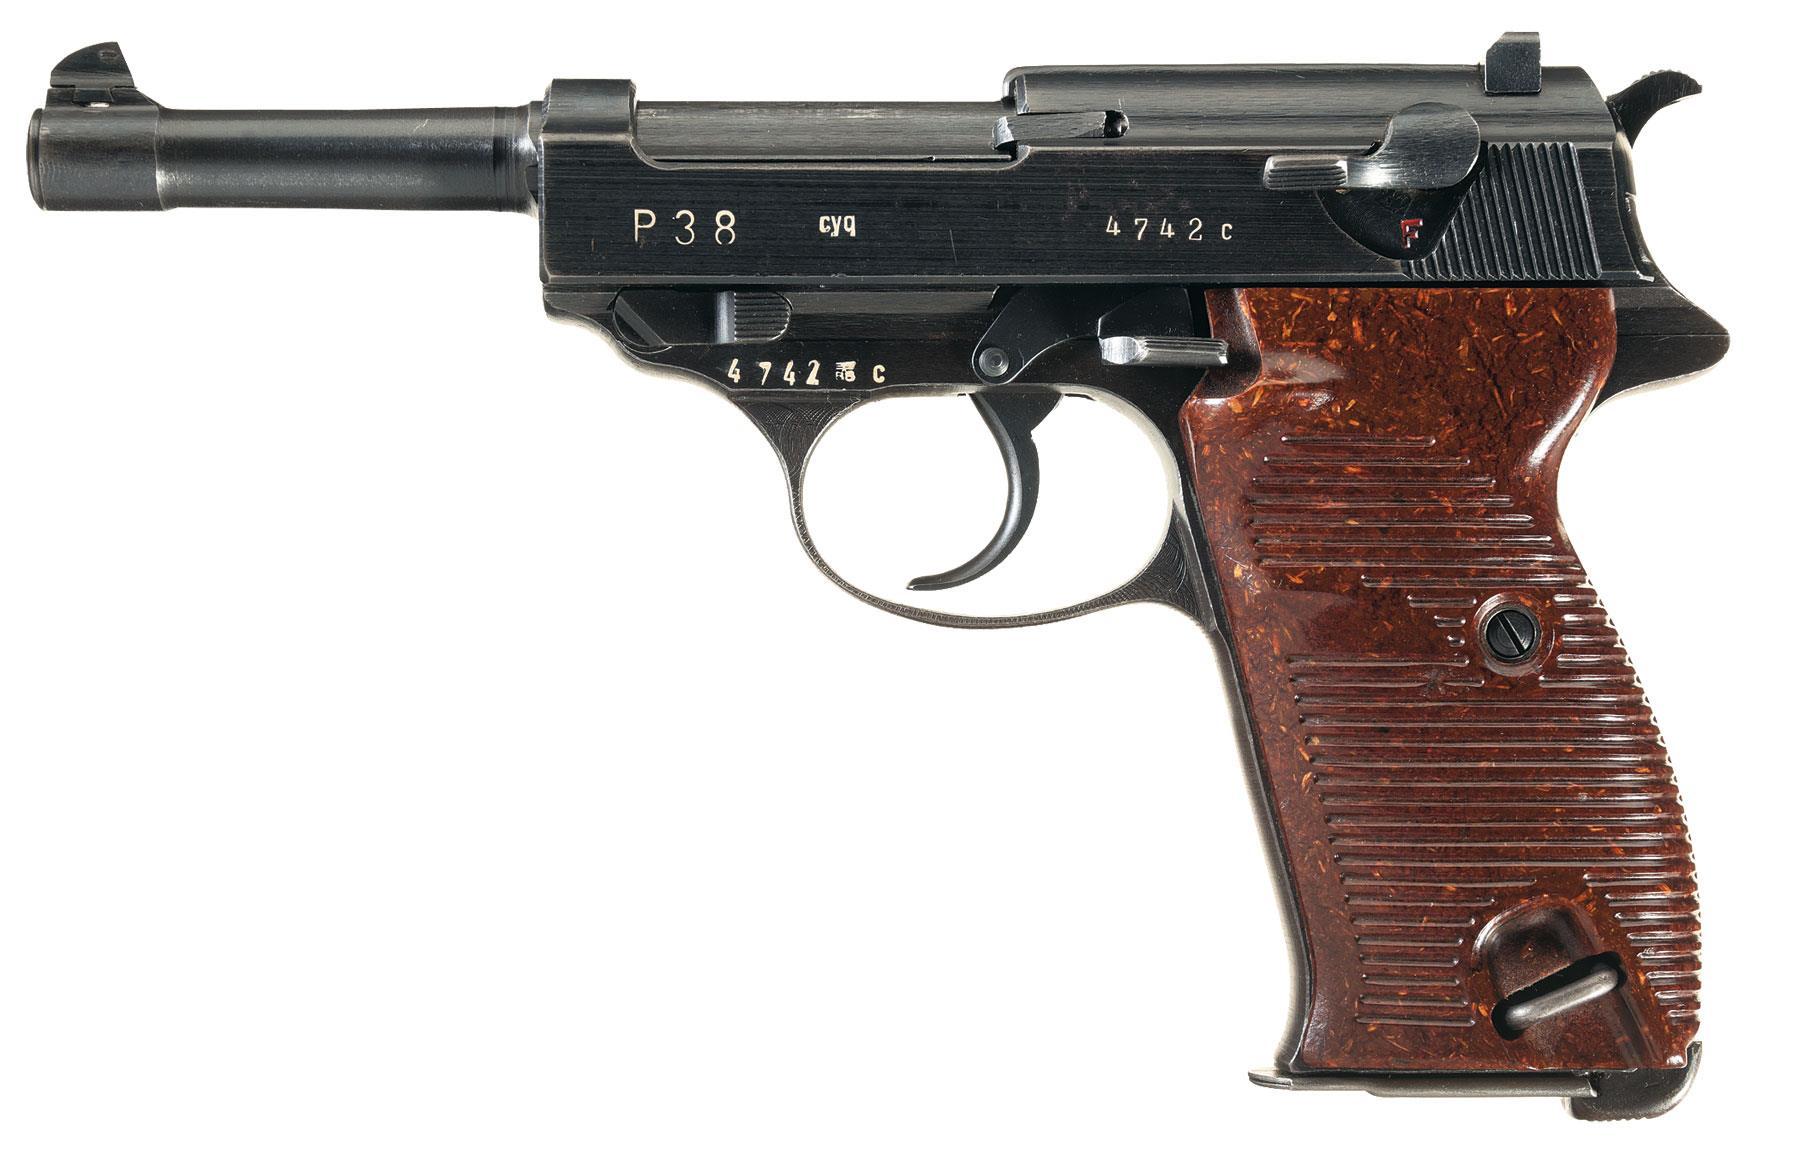 spreewerke cyq code p38 semi automatic pistol pistol firearms auction lot 3507. Black Bedroom Furniture Sets. Home Design Ideas